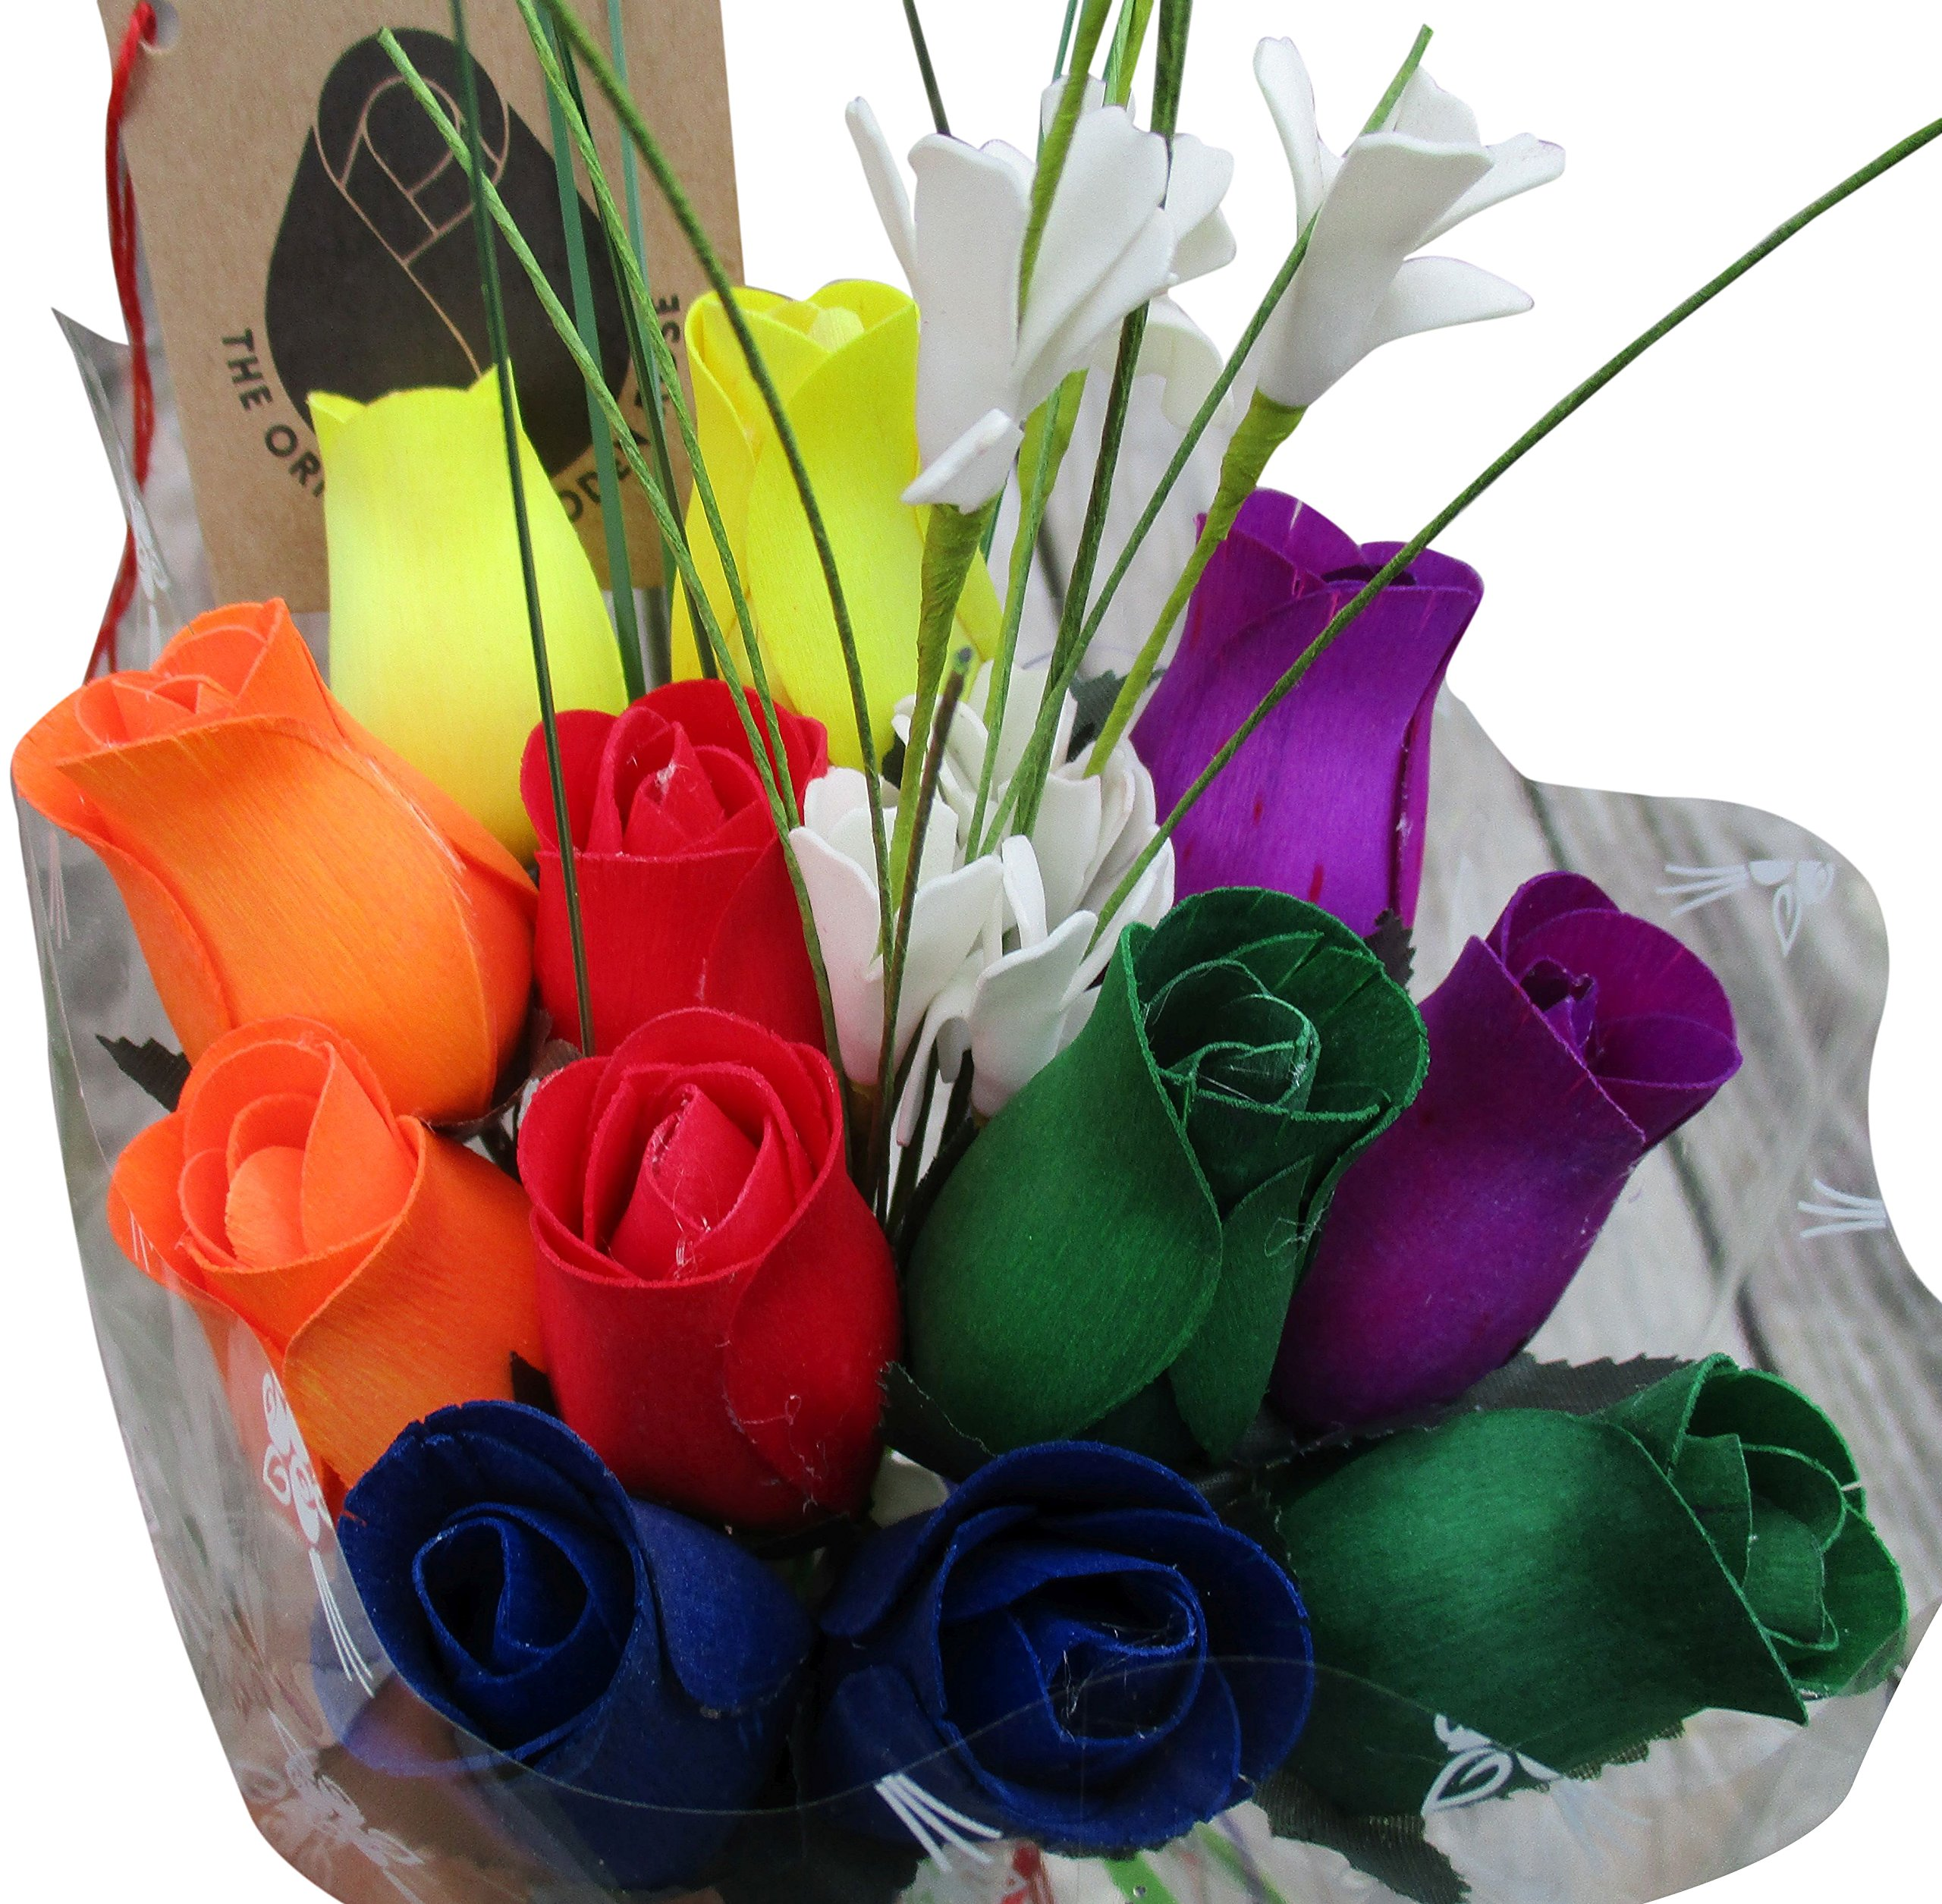 The Original Wooden Rose Gay Pride Flower Bouquet Closed Bud Rainbow Colors (1 Dozen)